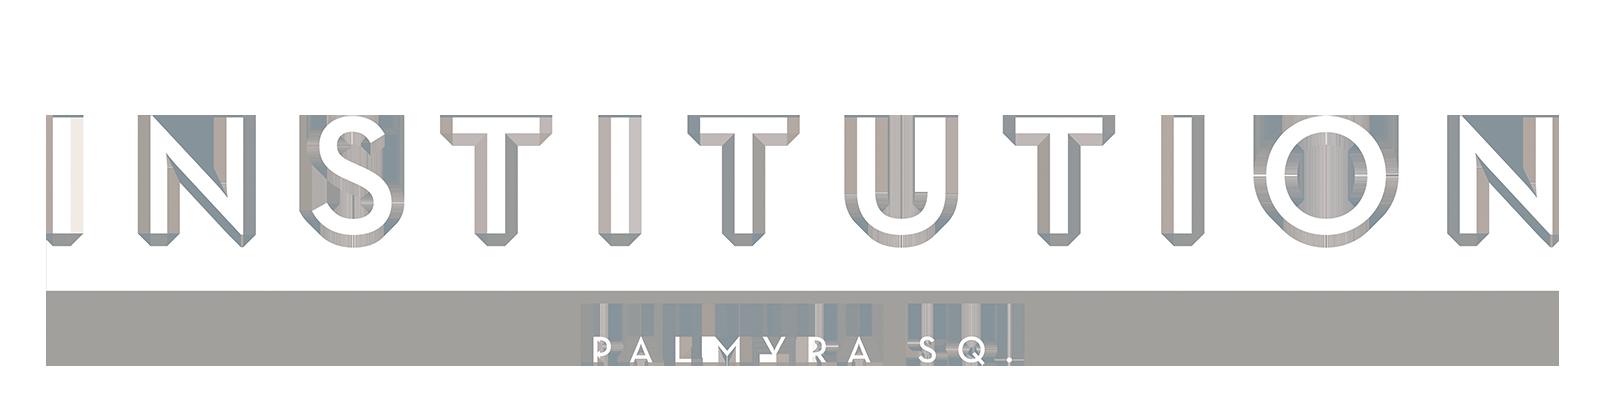 institution-bar-logo